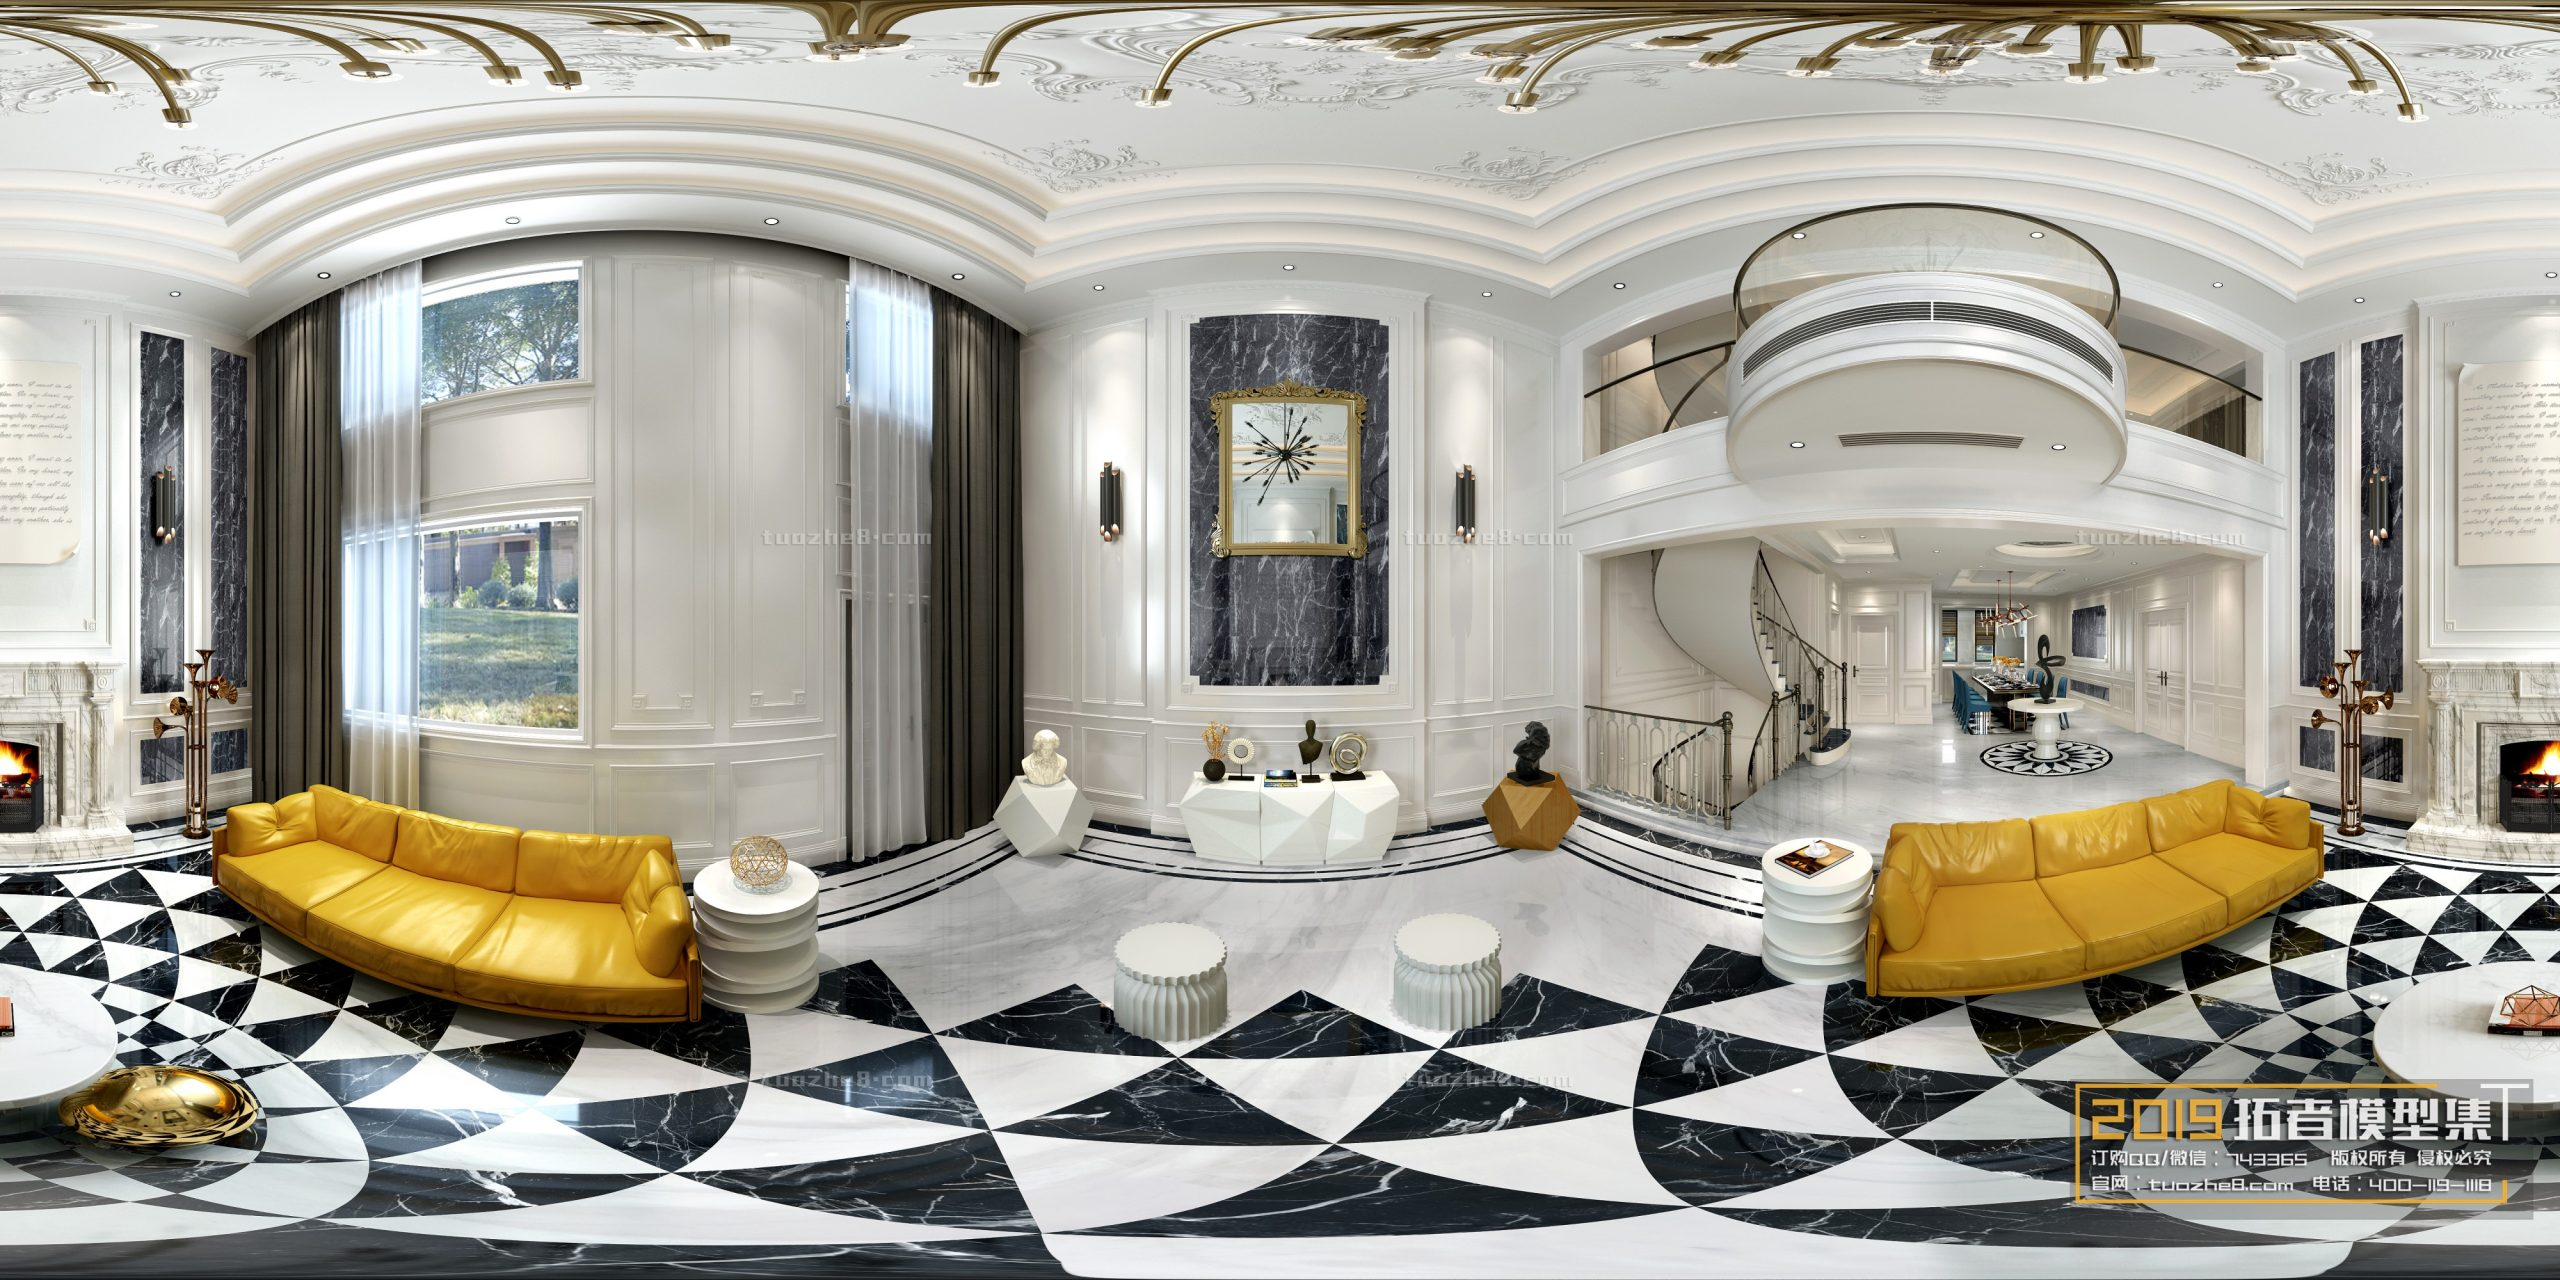 LIVING ROOM – EUROPEAN STYLE – No.046